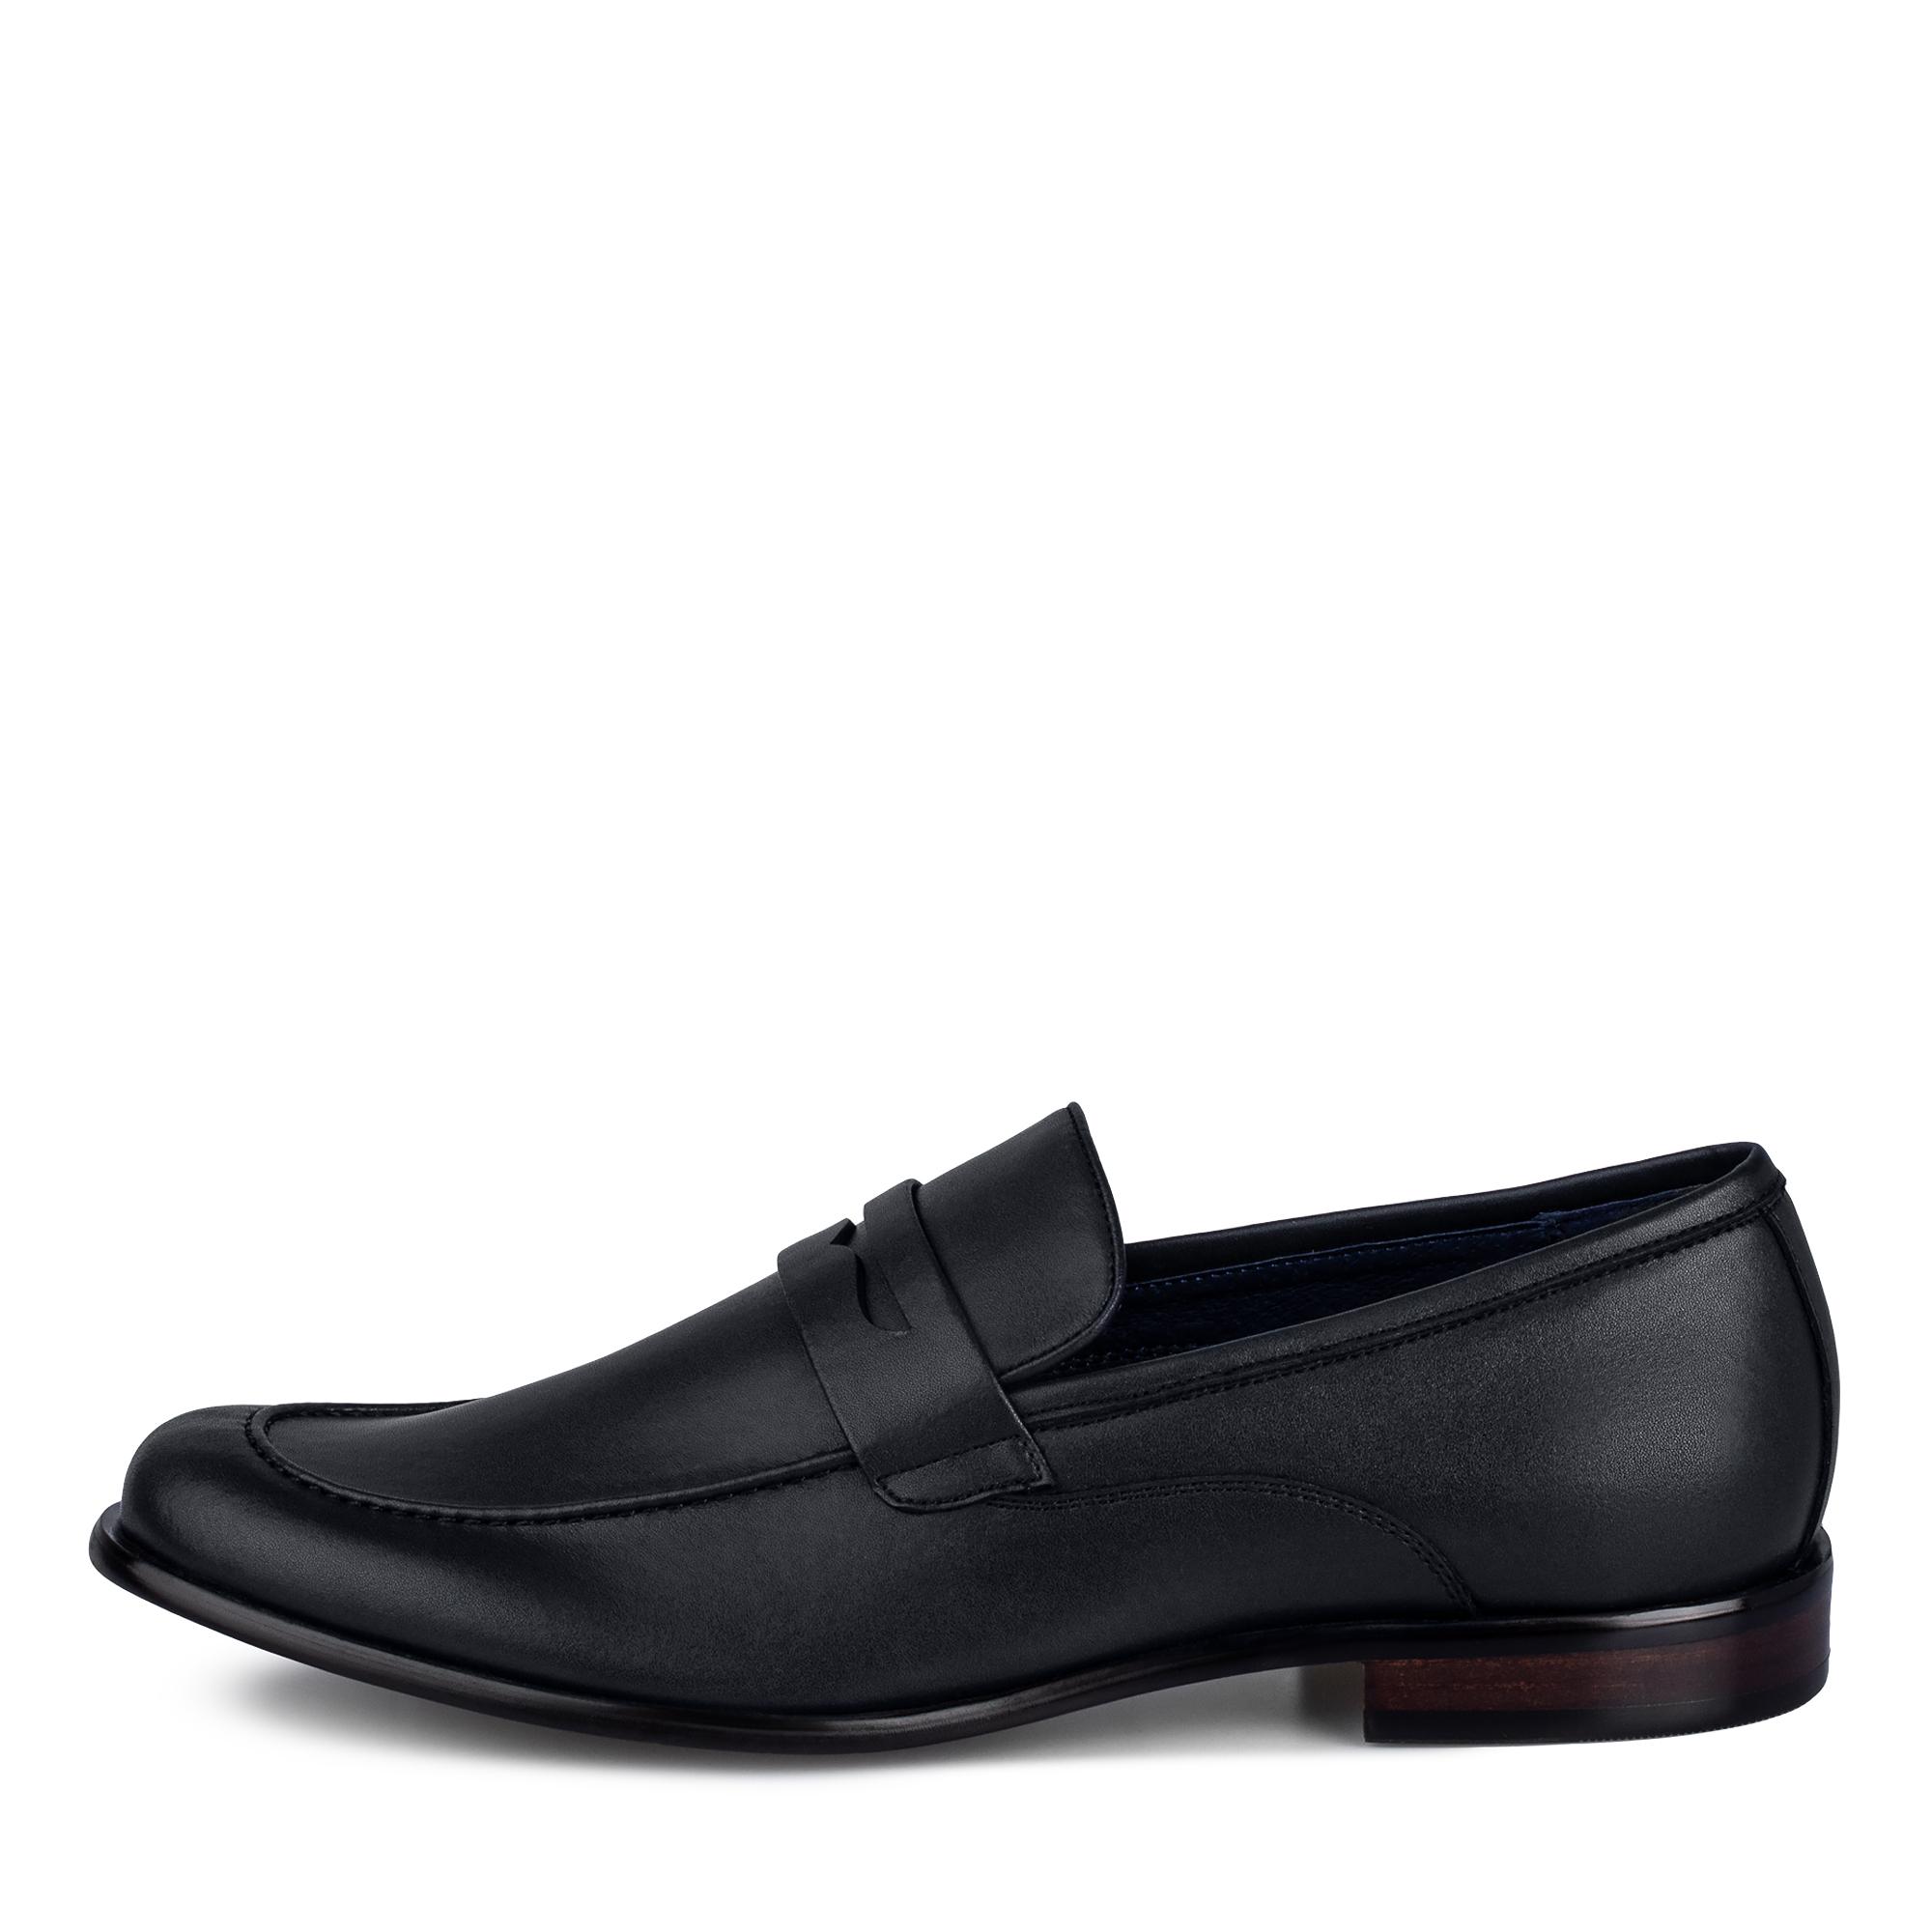 Туфли/полуботинки Thomas Munz 058-782A-1603